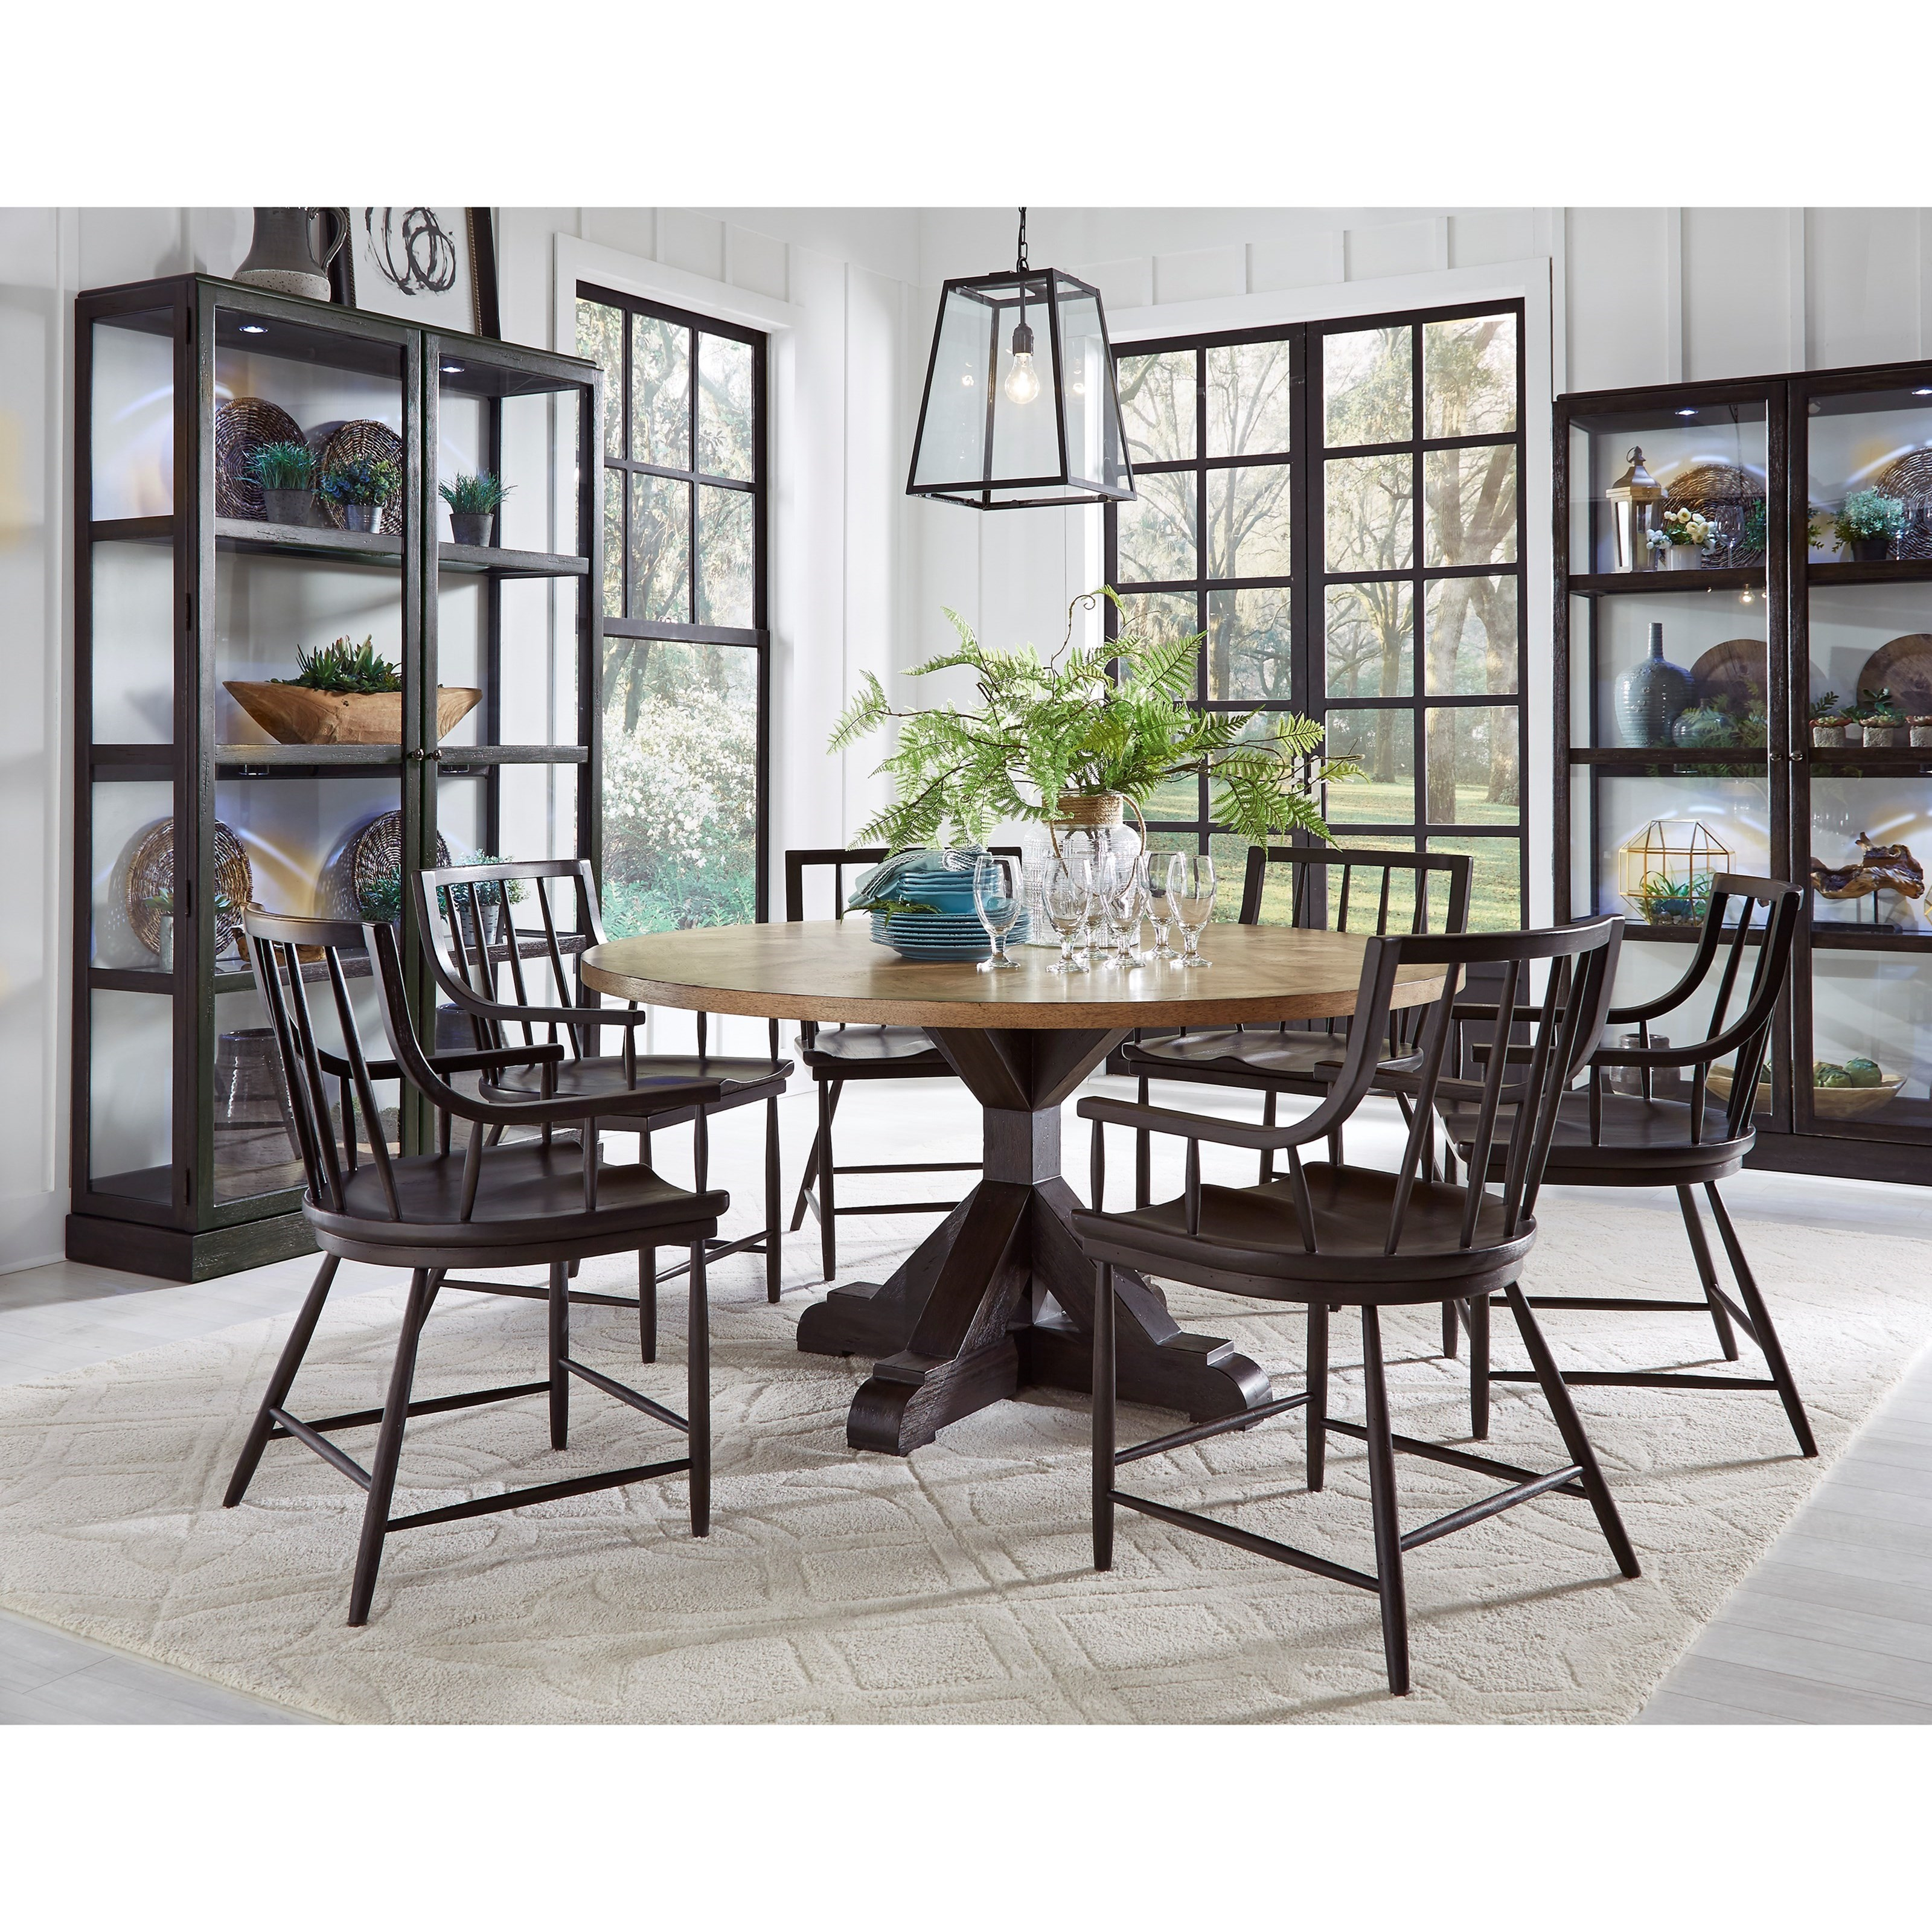 Pulaski Dining Room: Pulaski Furniture The Art Of Dining Formal Dining Room